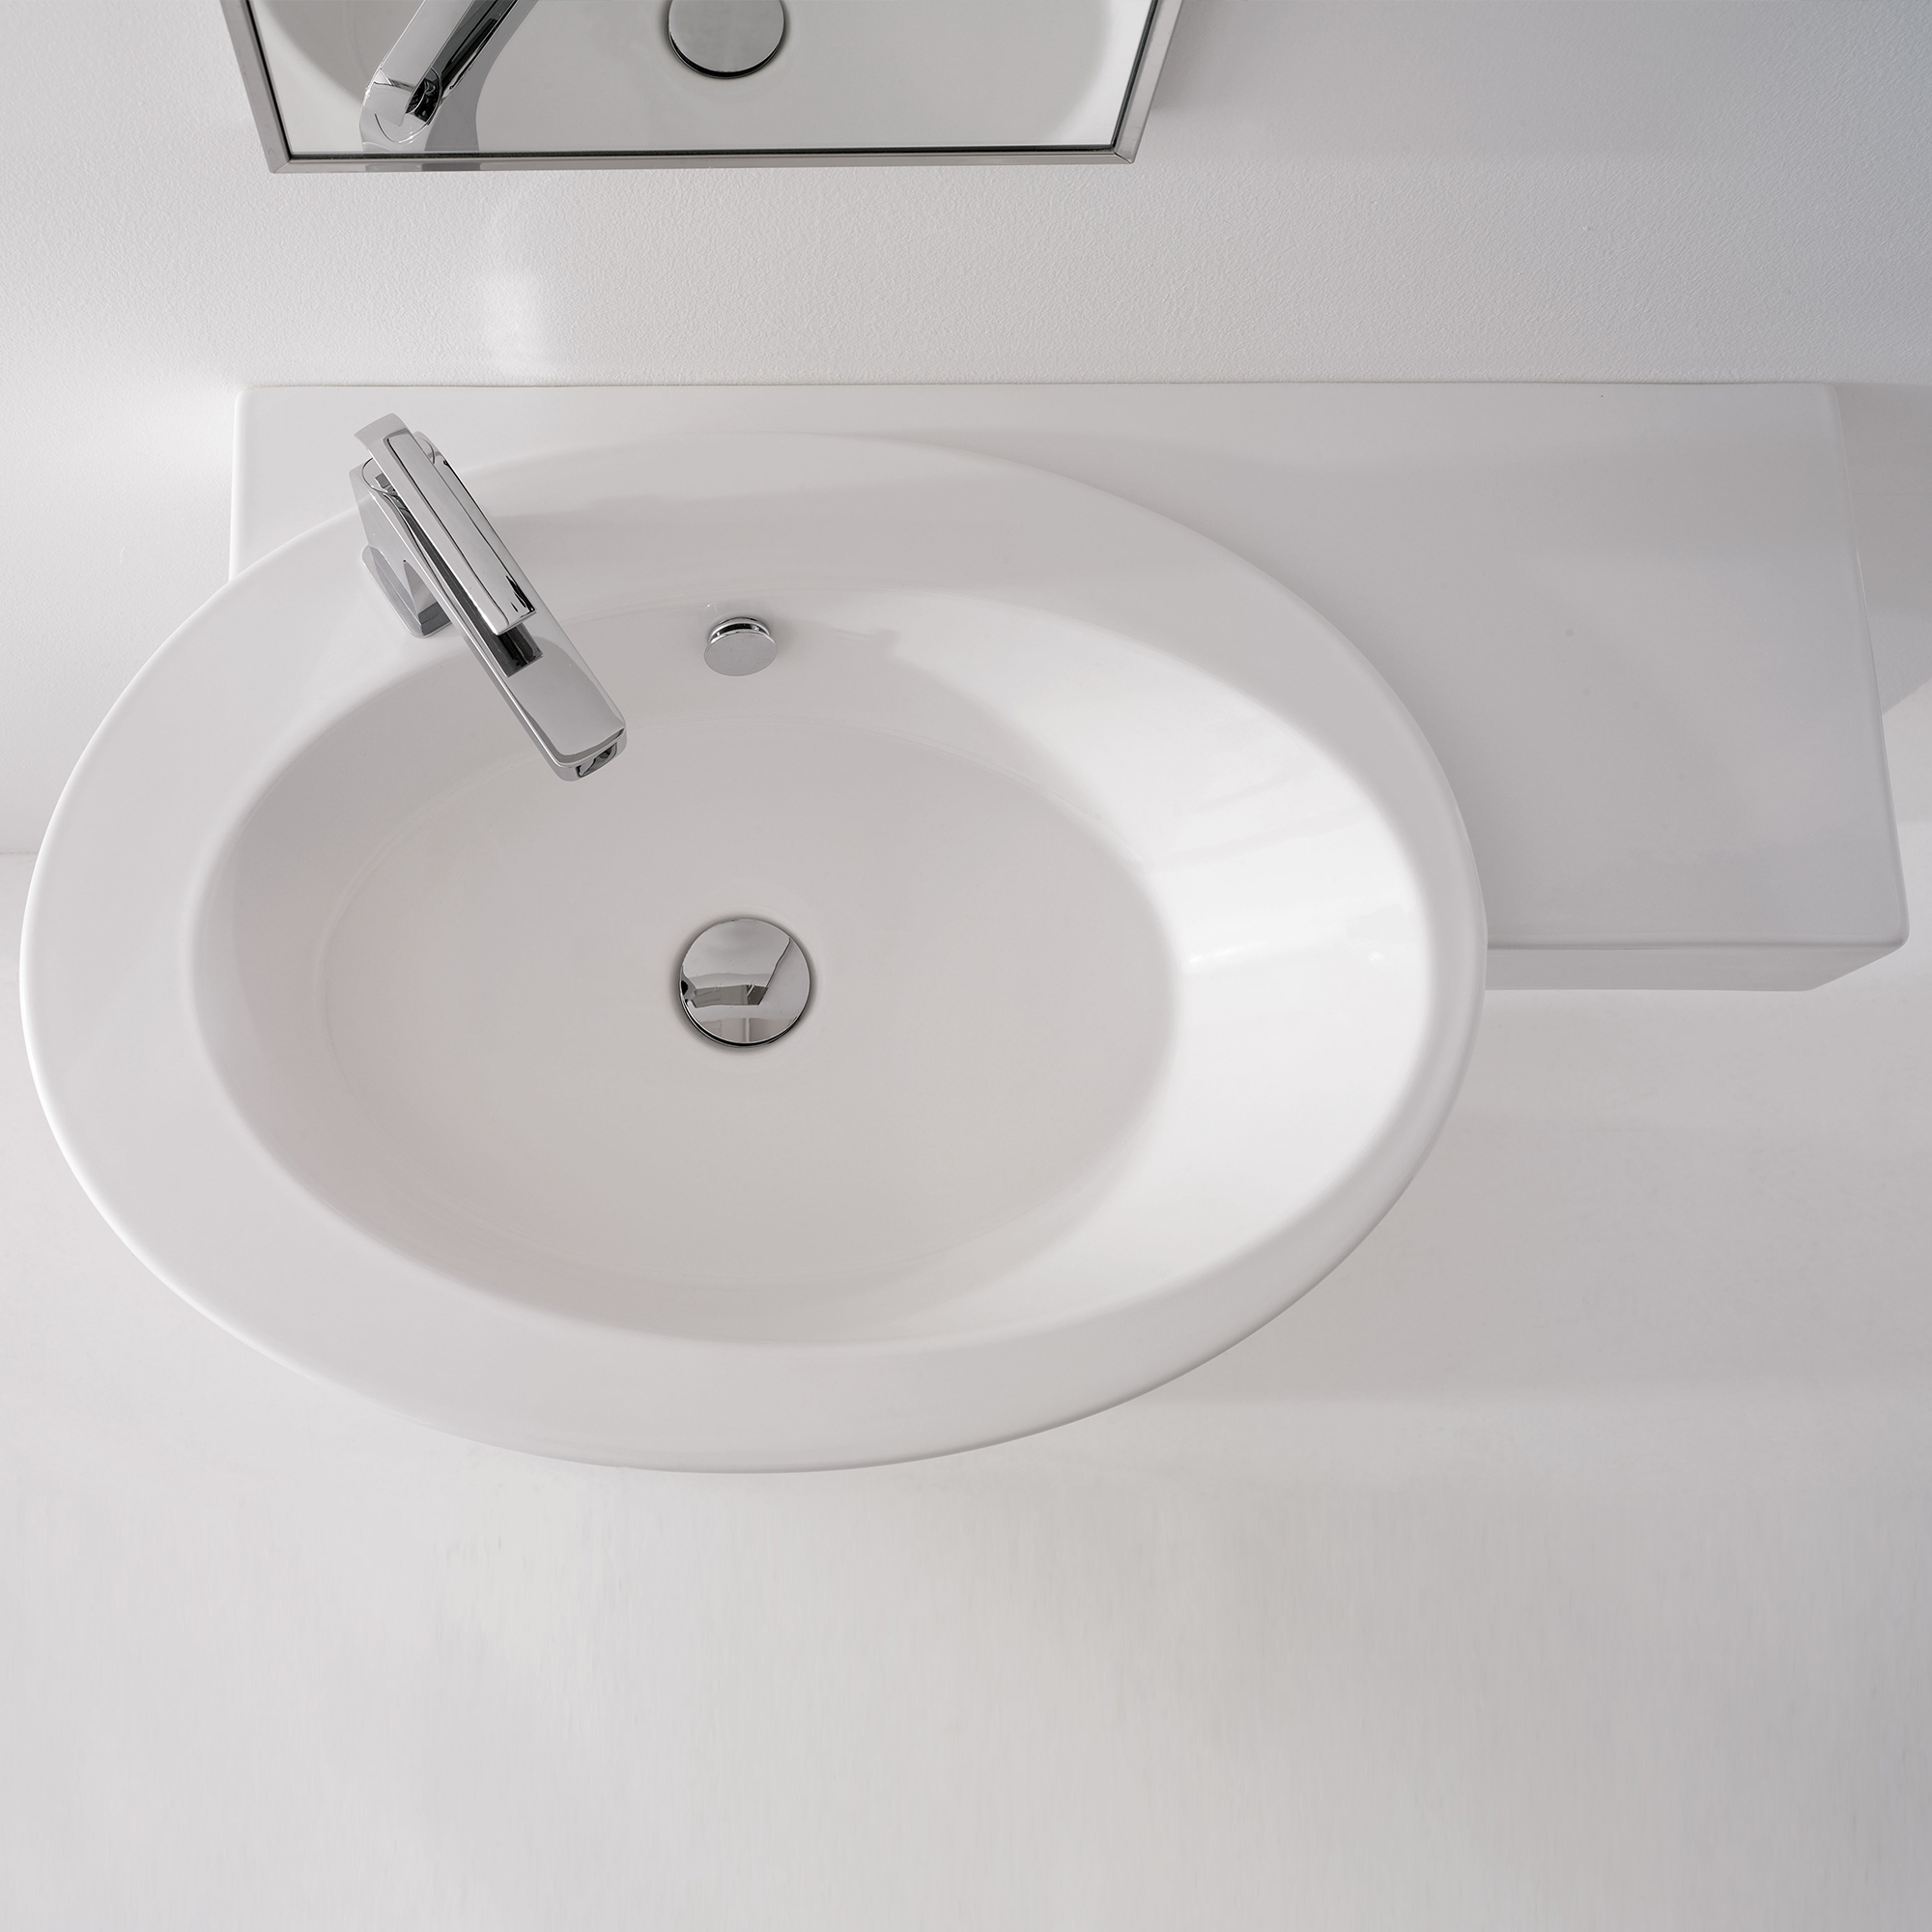 scarabeo wish waschtisch kragstain rechts 2011 reuter. Black Bedroom Furniture Sets. Home Design Ideas